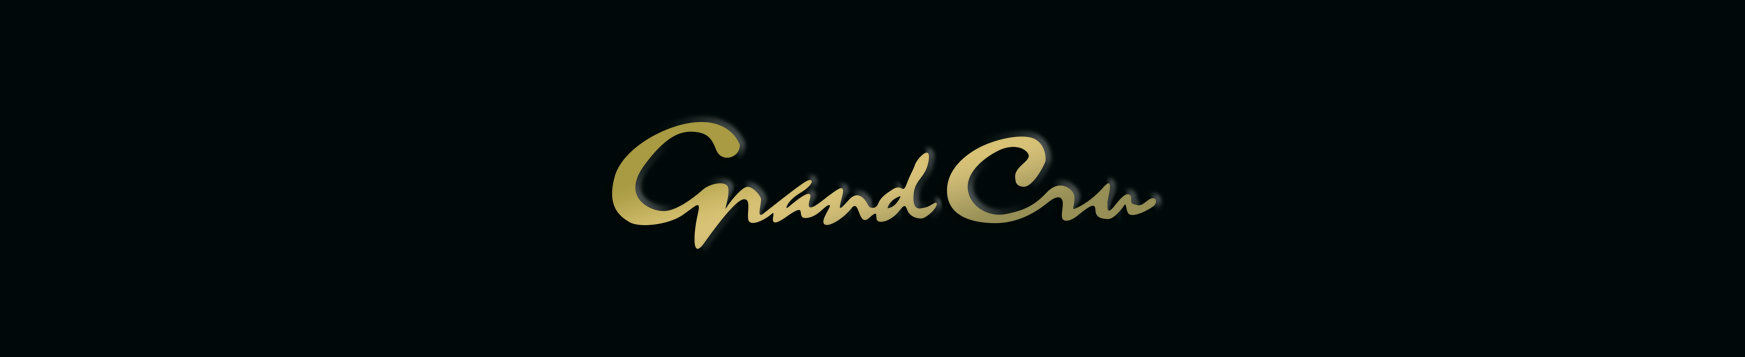 grandcru jewelry グランクリュ